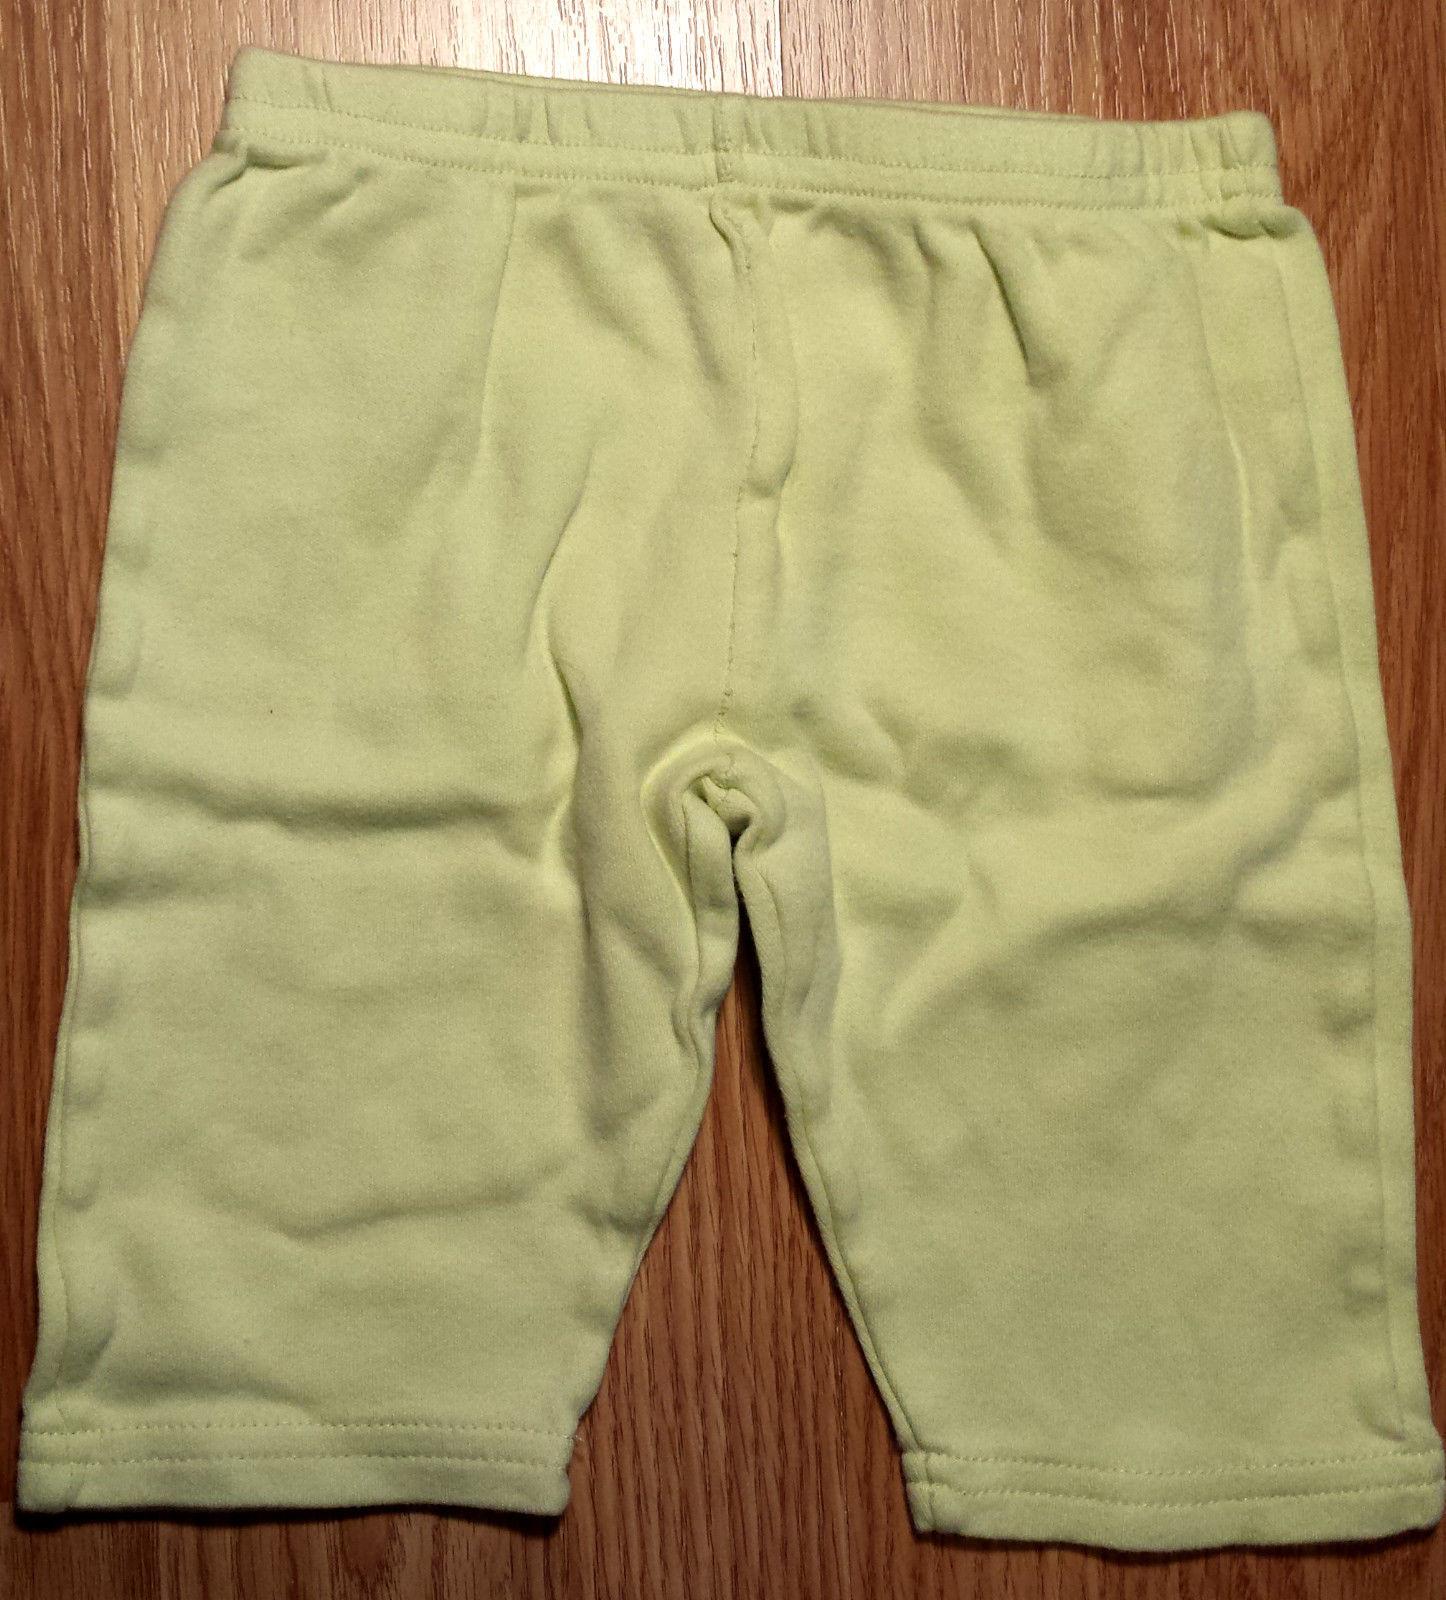 Boy's or Girl's Size 3-6 M Months 2 PC White Turtle Polka Dot Top & Green Pants